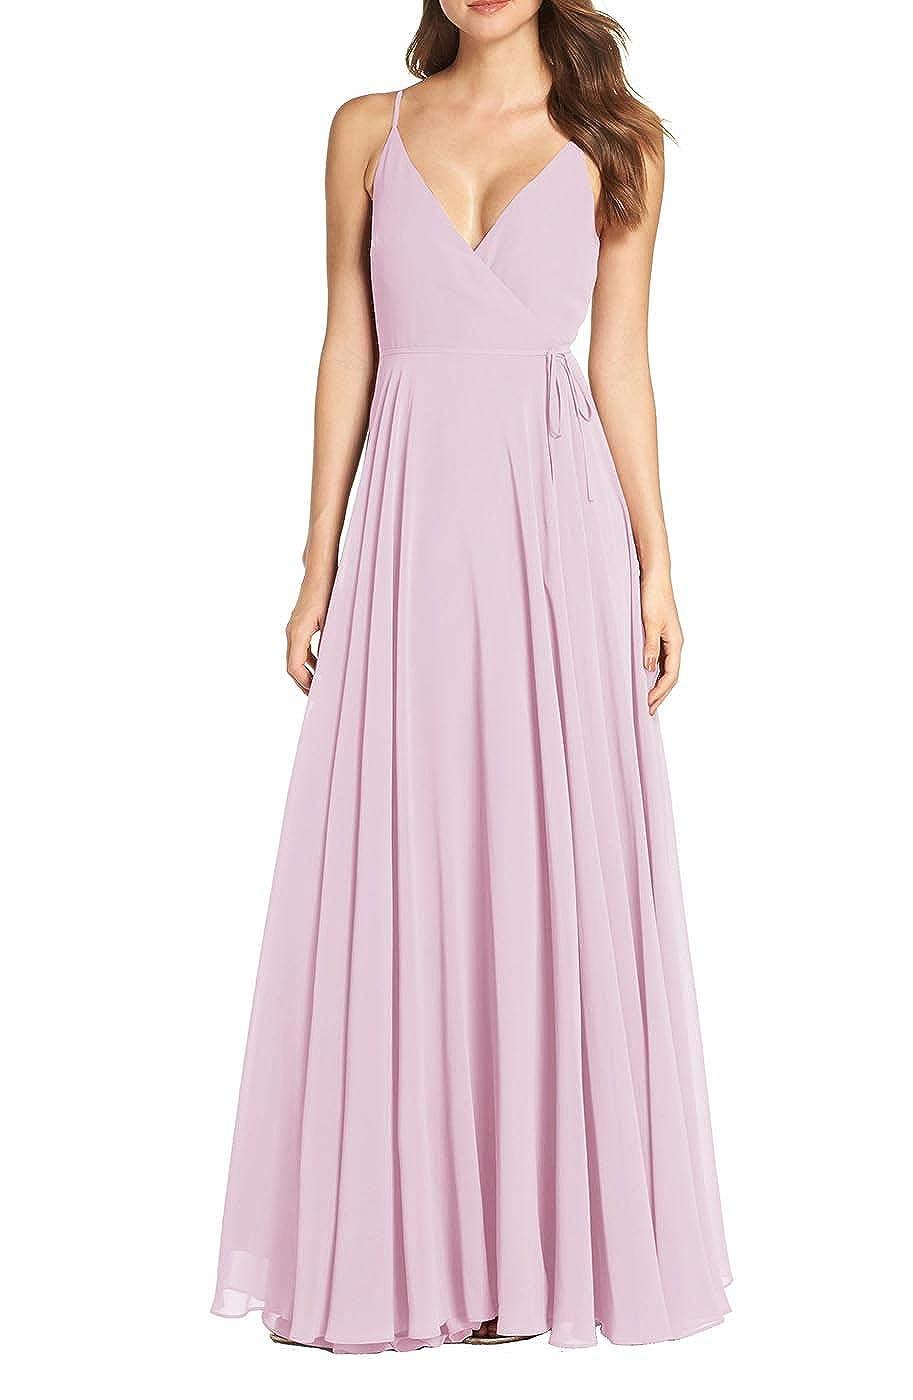 bluesh RTTUTED Women's V Neck Sleeveless Evening Dresses Long Prom Gown Bridesmaid Maxi Skirt